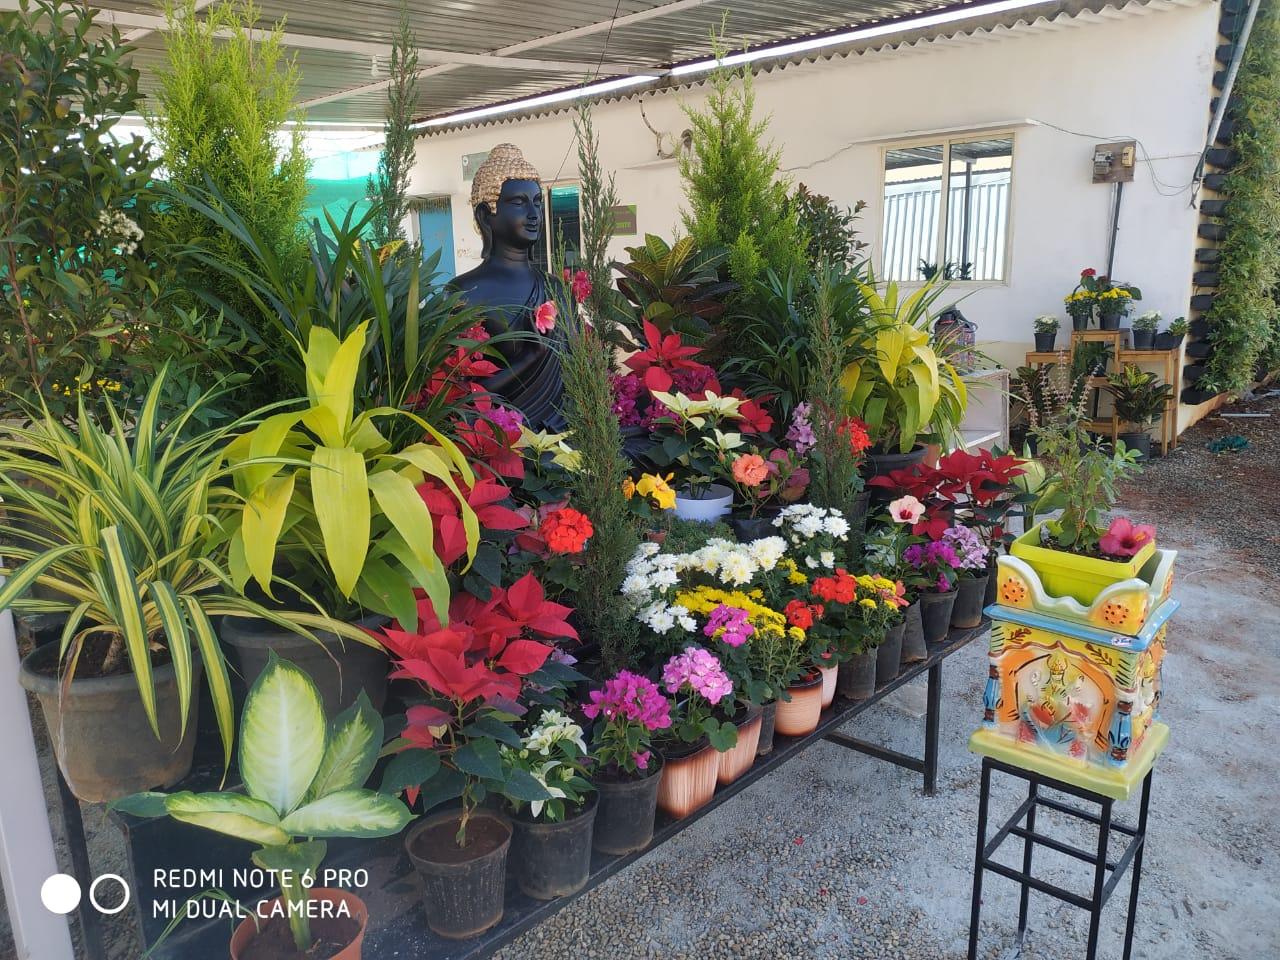 FLOWERING PLANTS IN YELAHANKA  | EMPHASIS LANDSCAPE & DESIGN | POT WHOLESALER, PLANT NURSERY NEAR ME ,FLOWERING POT WHOLESALER IN BANGALORE, PLASTIC POT WHOLESALER, FLOWERING PLANTS WHOLESALERS IN BANGALORE ,FLOWERING PLANTS WHOLESALERS IN YELAHANKA - GL101475